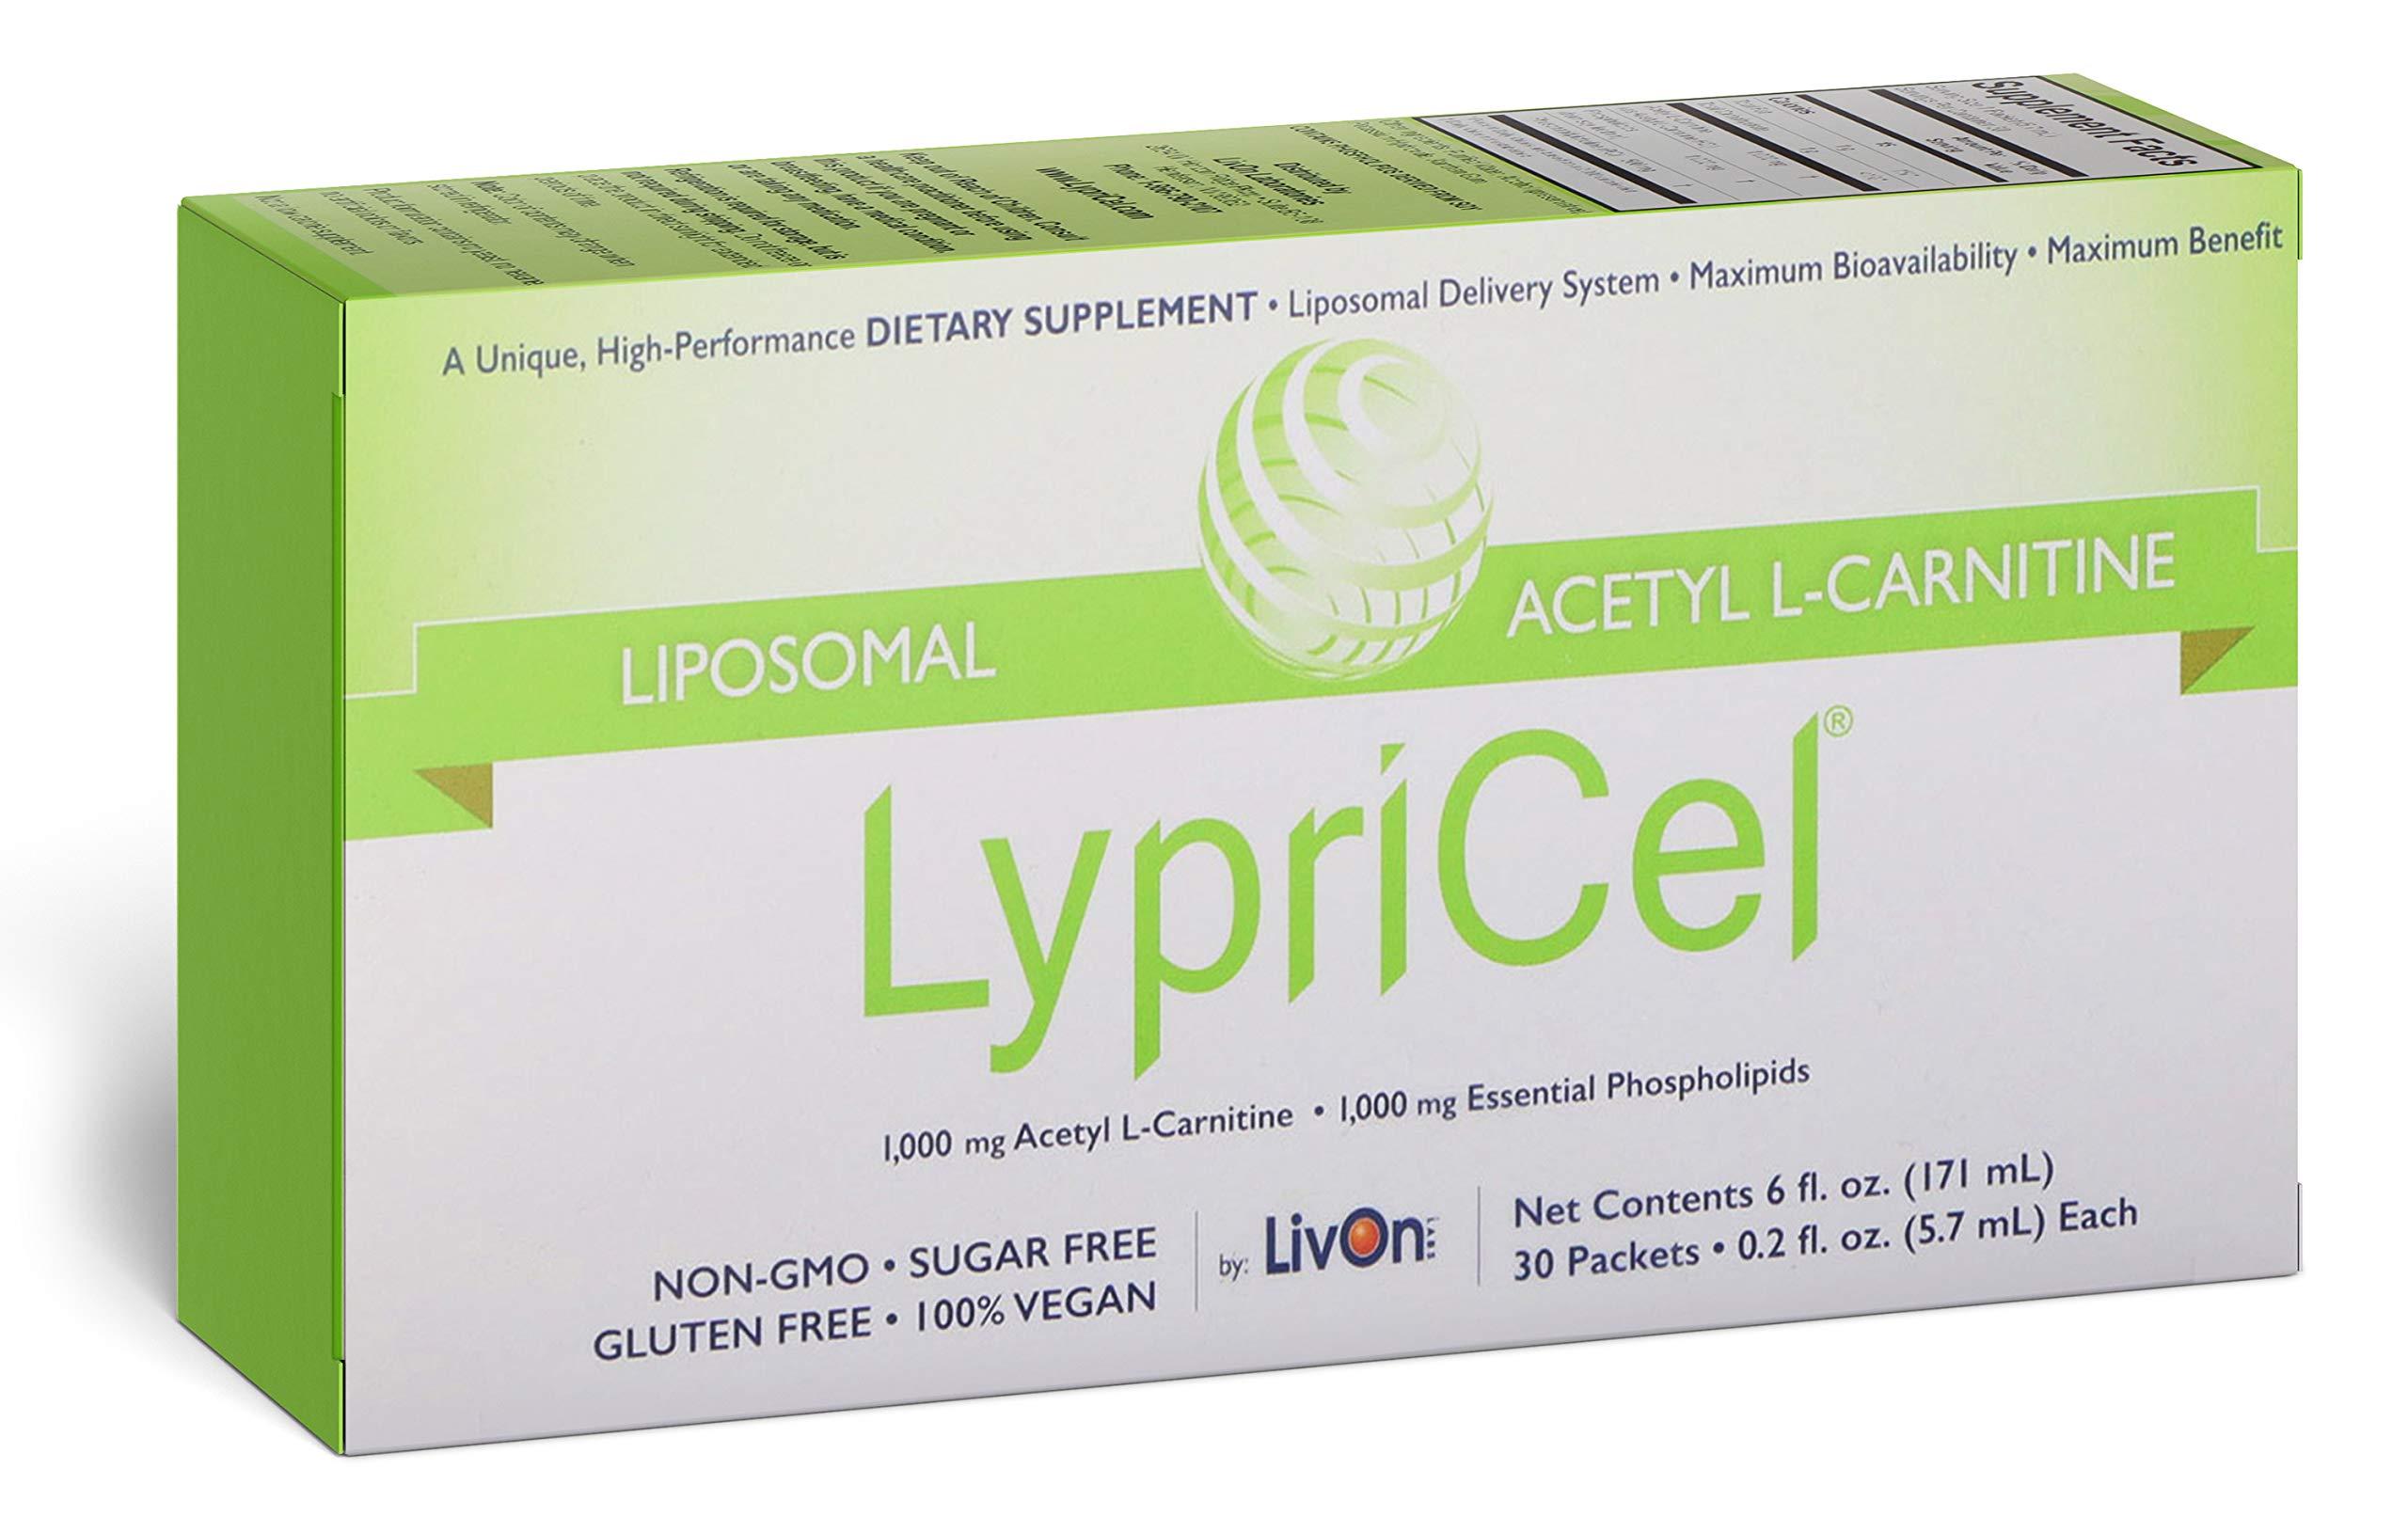 LypriCel Liposomal Acetyl L-Carnitine 30 Packets 0 2 fl oz 5 7 ml Each